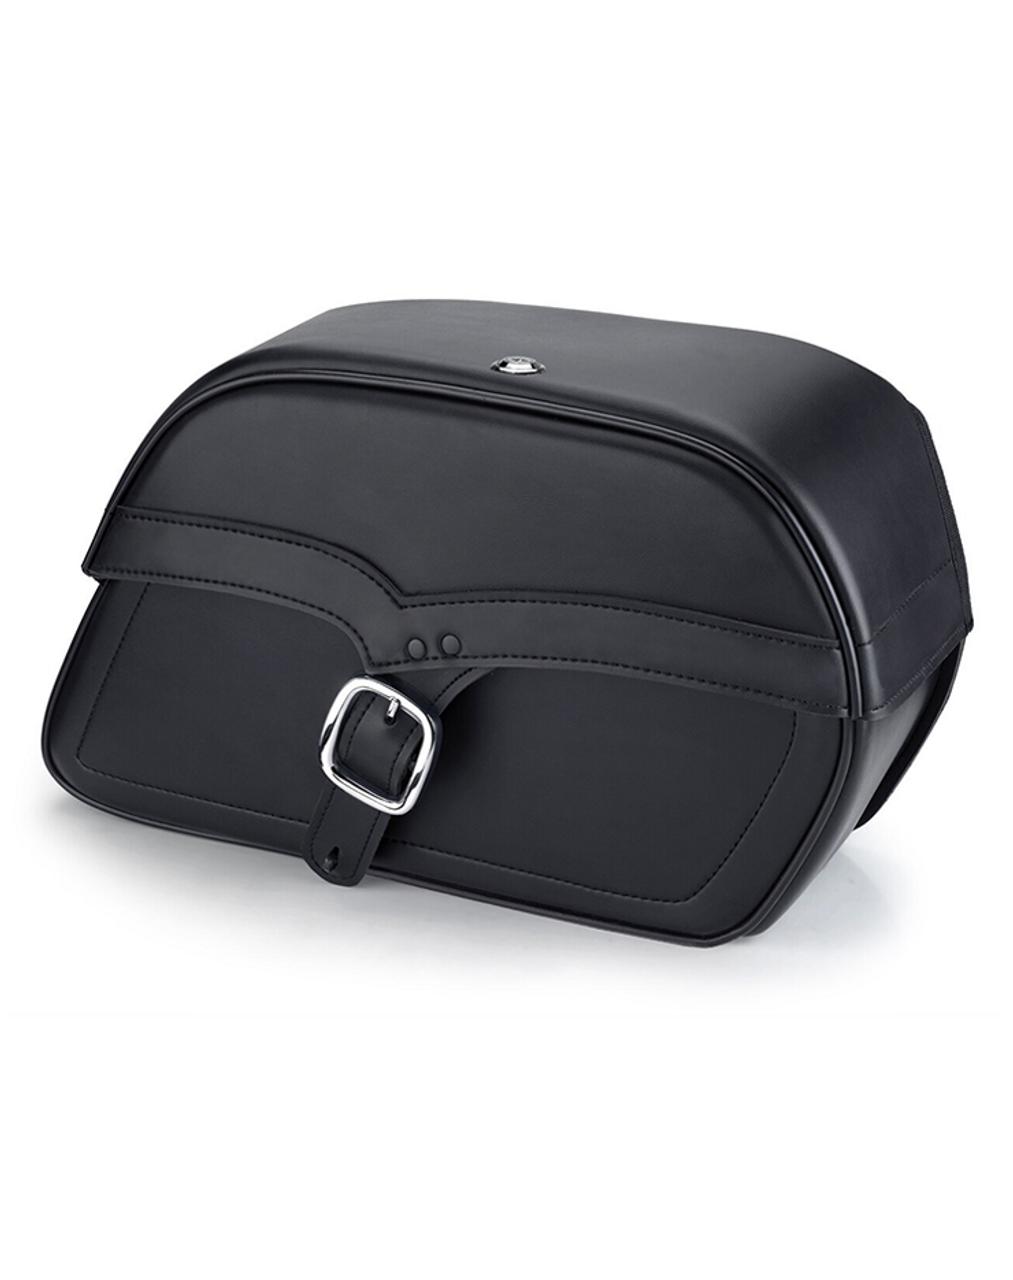 Viking Single Strap Large Shock Cutout Slanted Motorcycle Saddlebags For Harley Sportster Iron 1200 Main Bag View